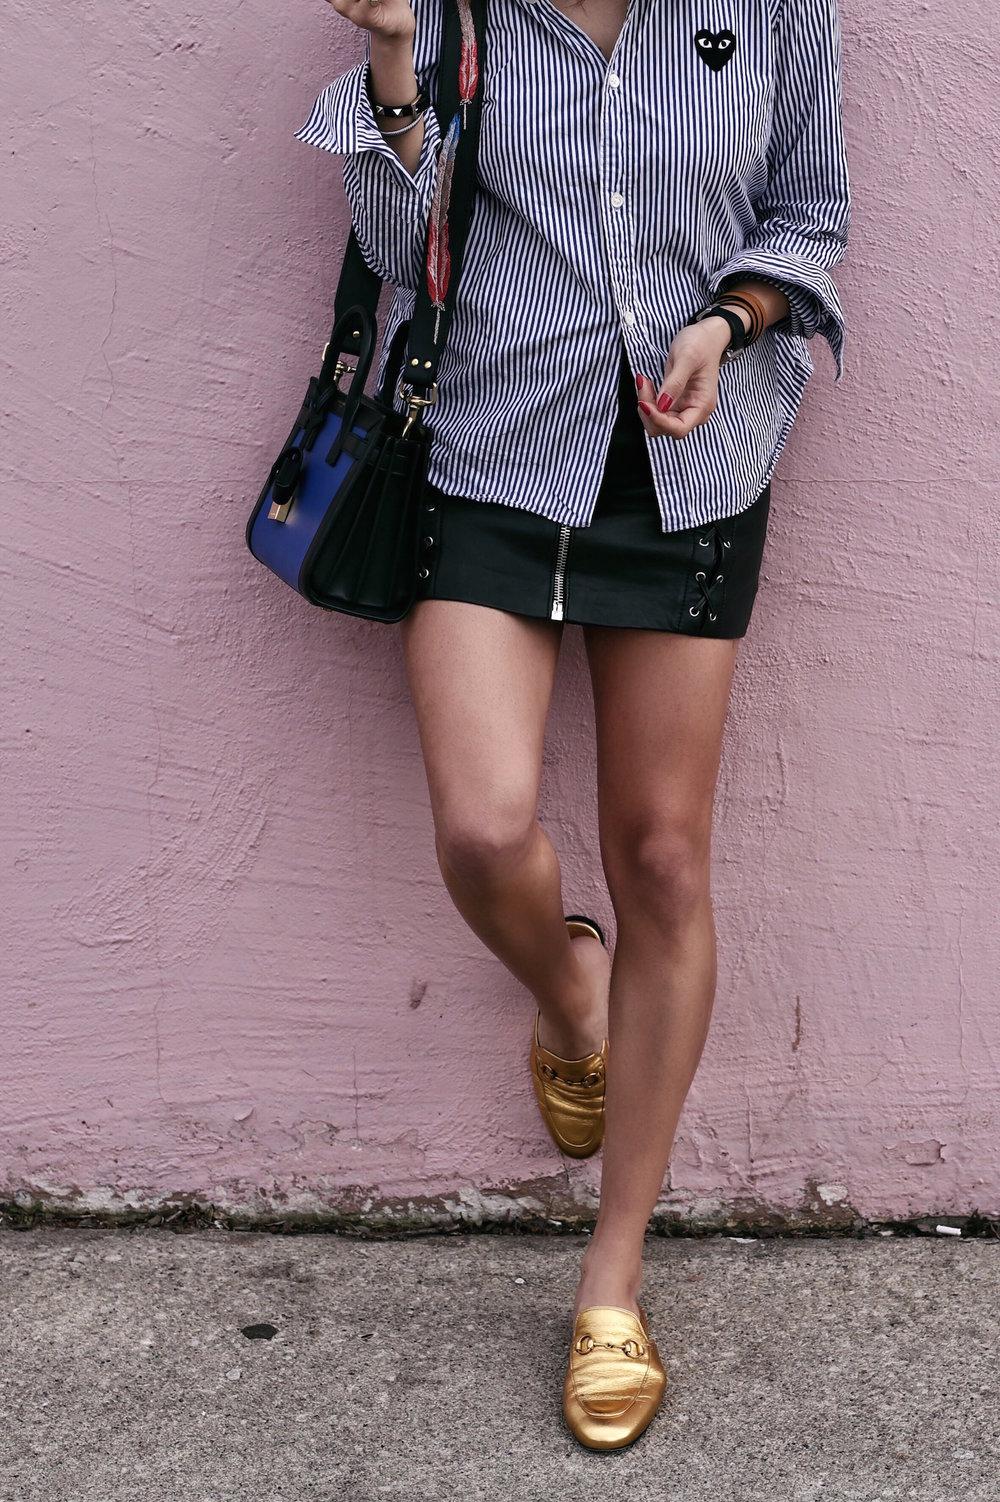 comme+des+garcons+striped+shirt+-+blue+saint+laurent+nano+sac+de+jour+bag+-+kate+cate+handbag+strap+-+the+kooples+leather+zip+skirt+-+summer+style+-+top+bun+hair+style+-+woahstyle_8074.jpg